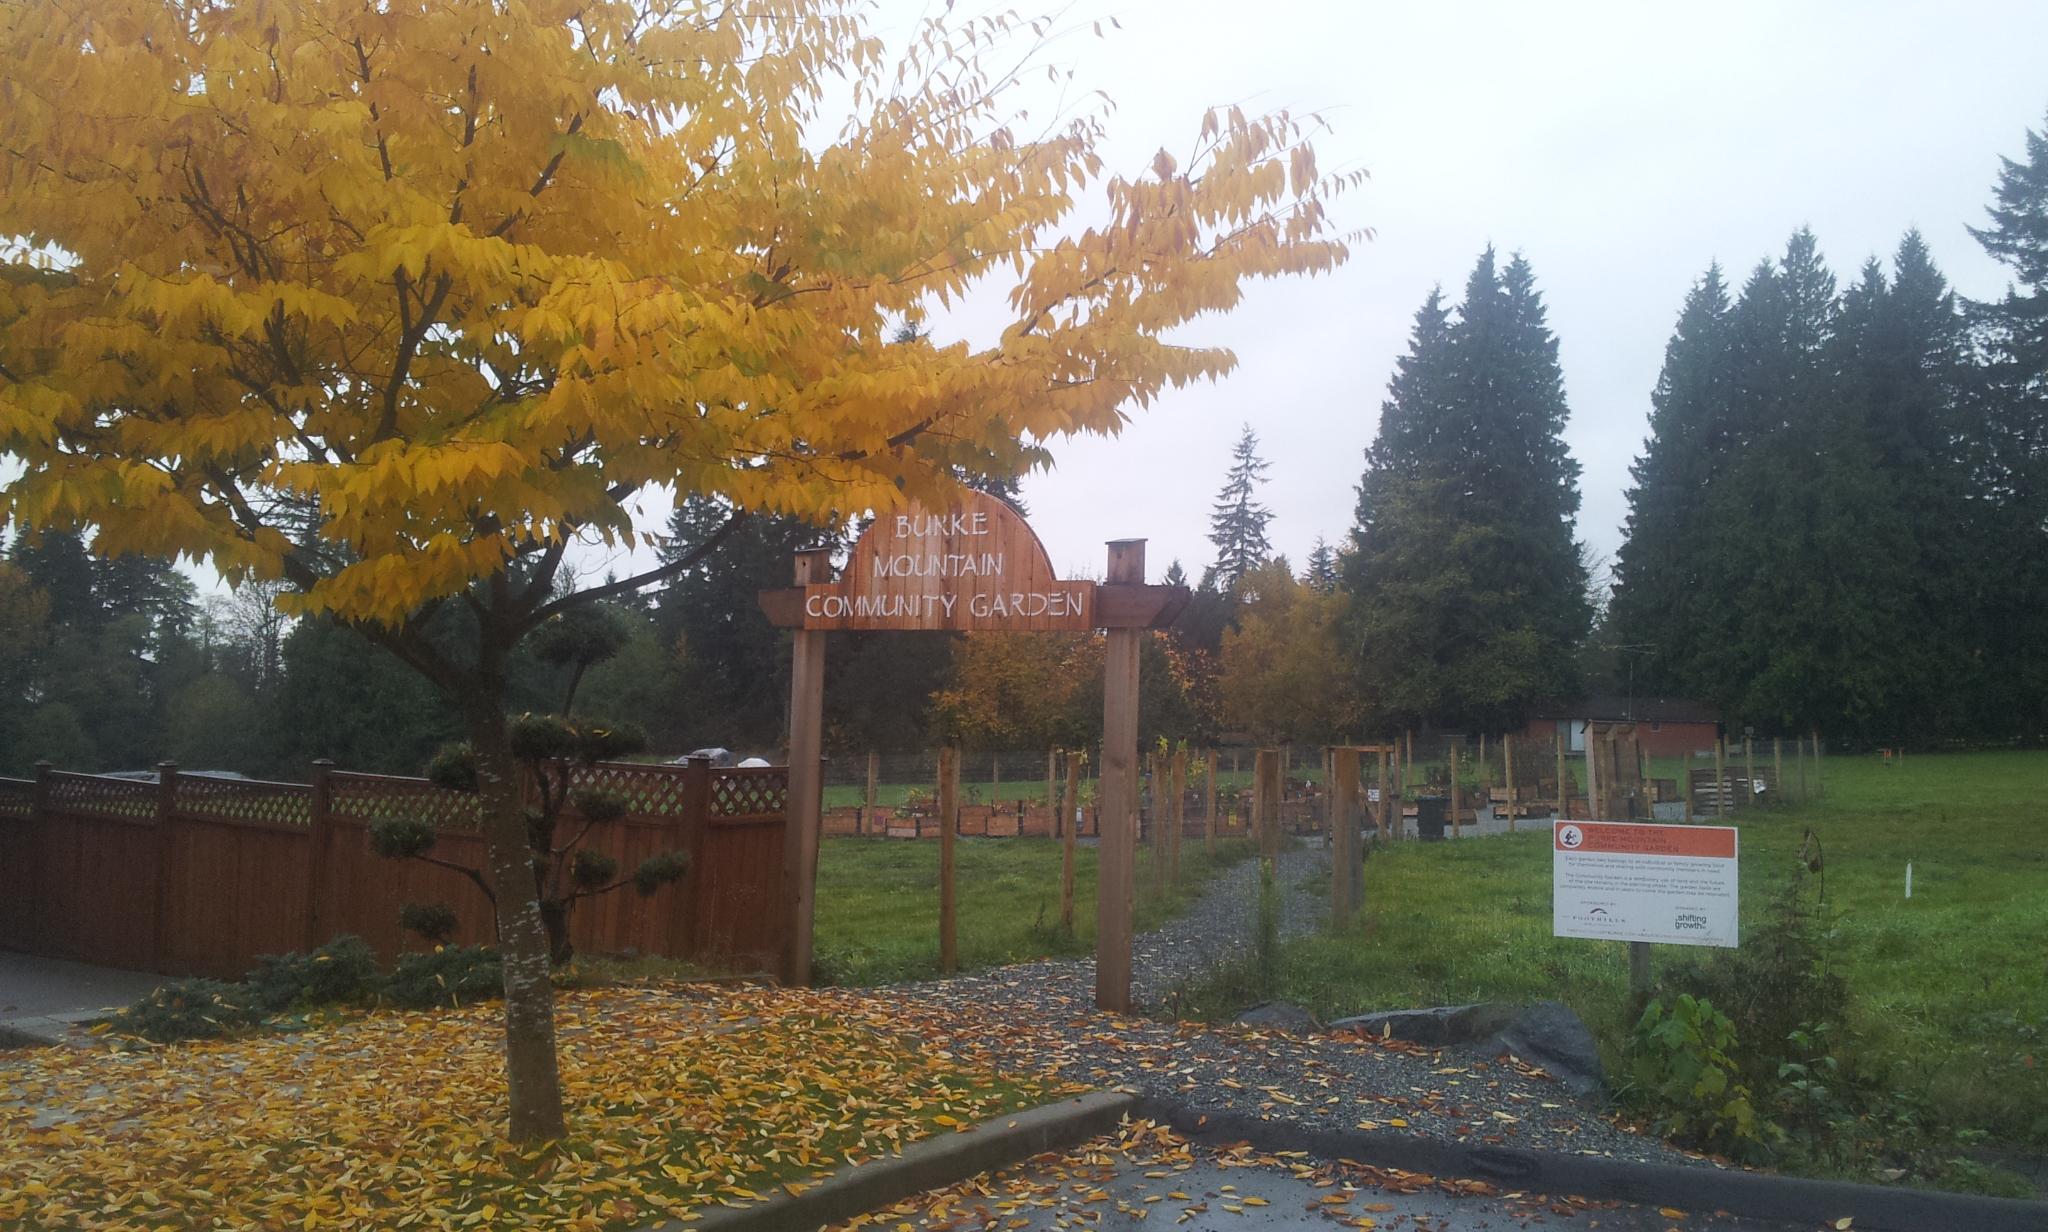 burke-mountain-temporary-community-garden-closing-112013_11244656286_o.jpg